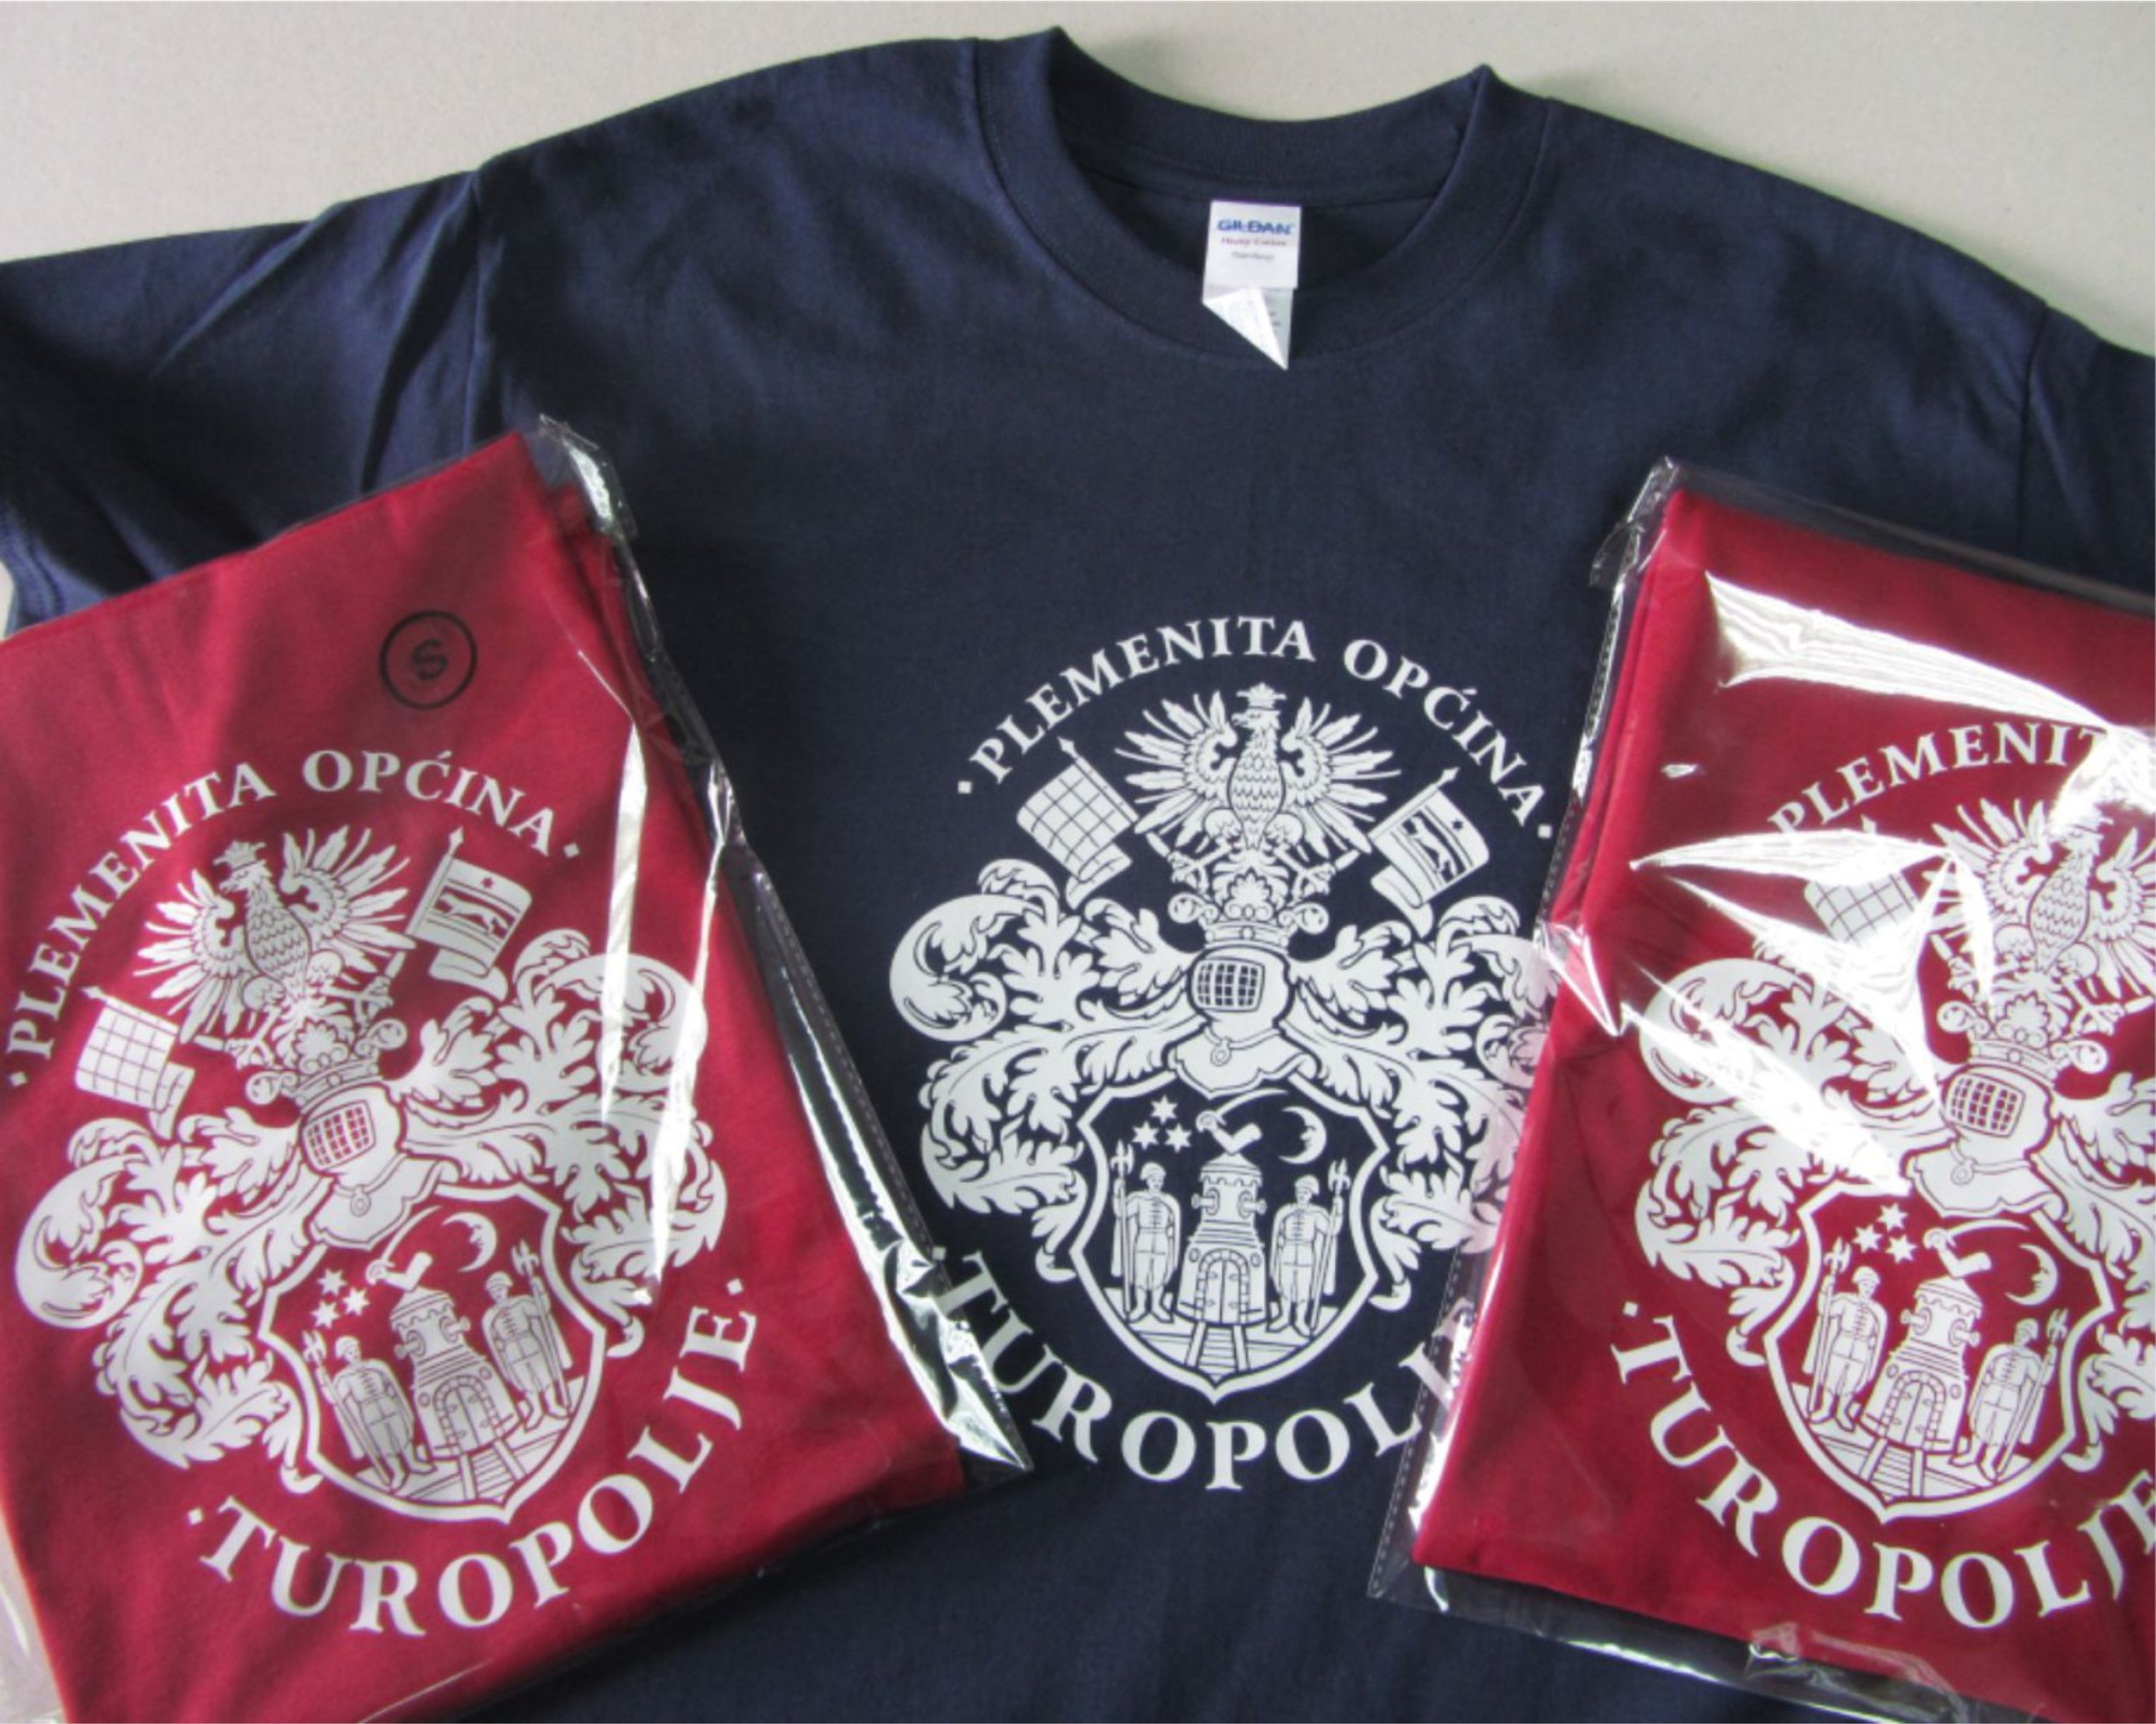 Design and production of T-shirts with your logo/crest on it.   Dizajn i izrada majica s Vašim logotipom ili grbom.